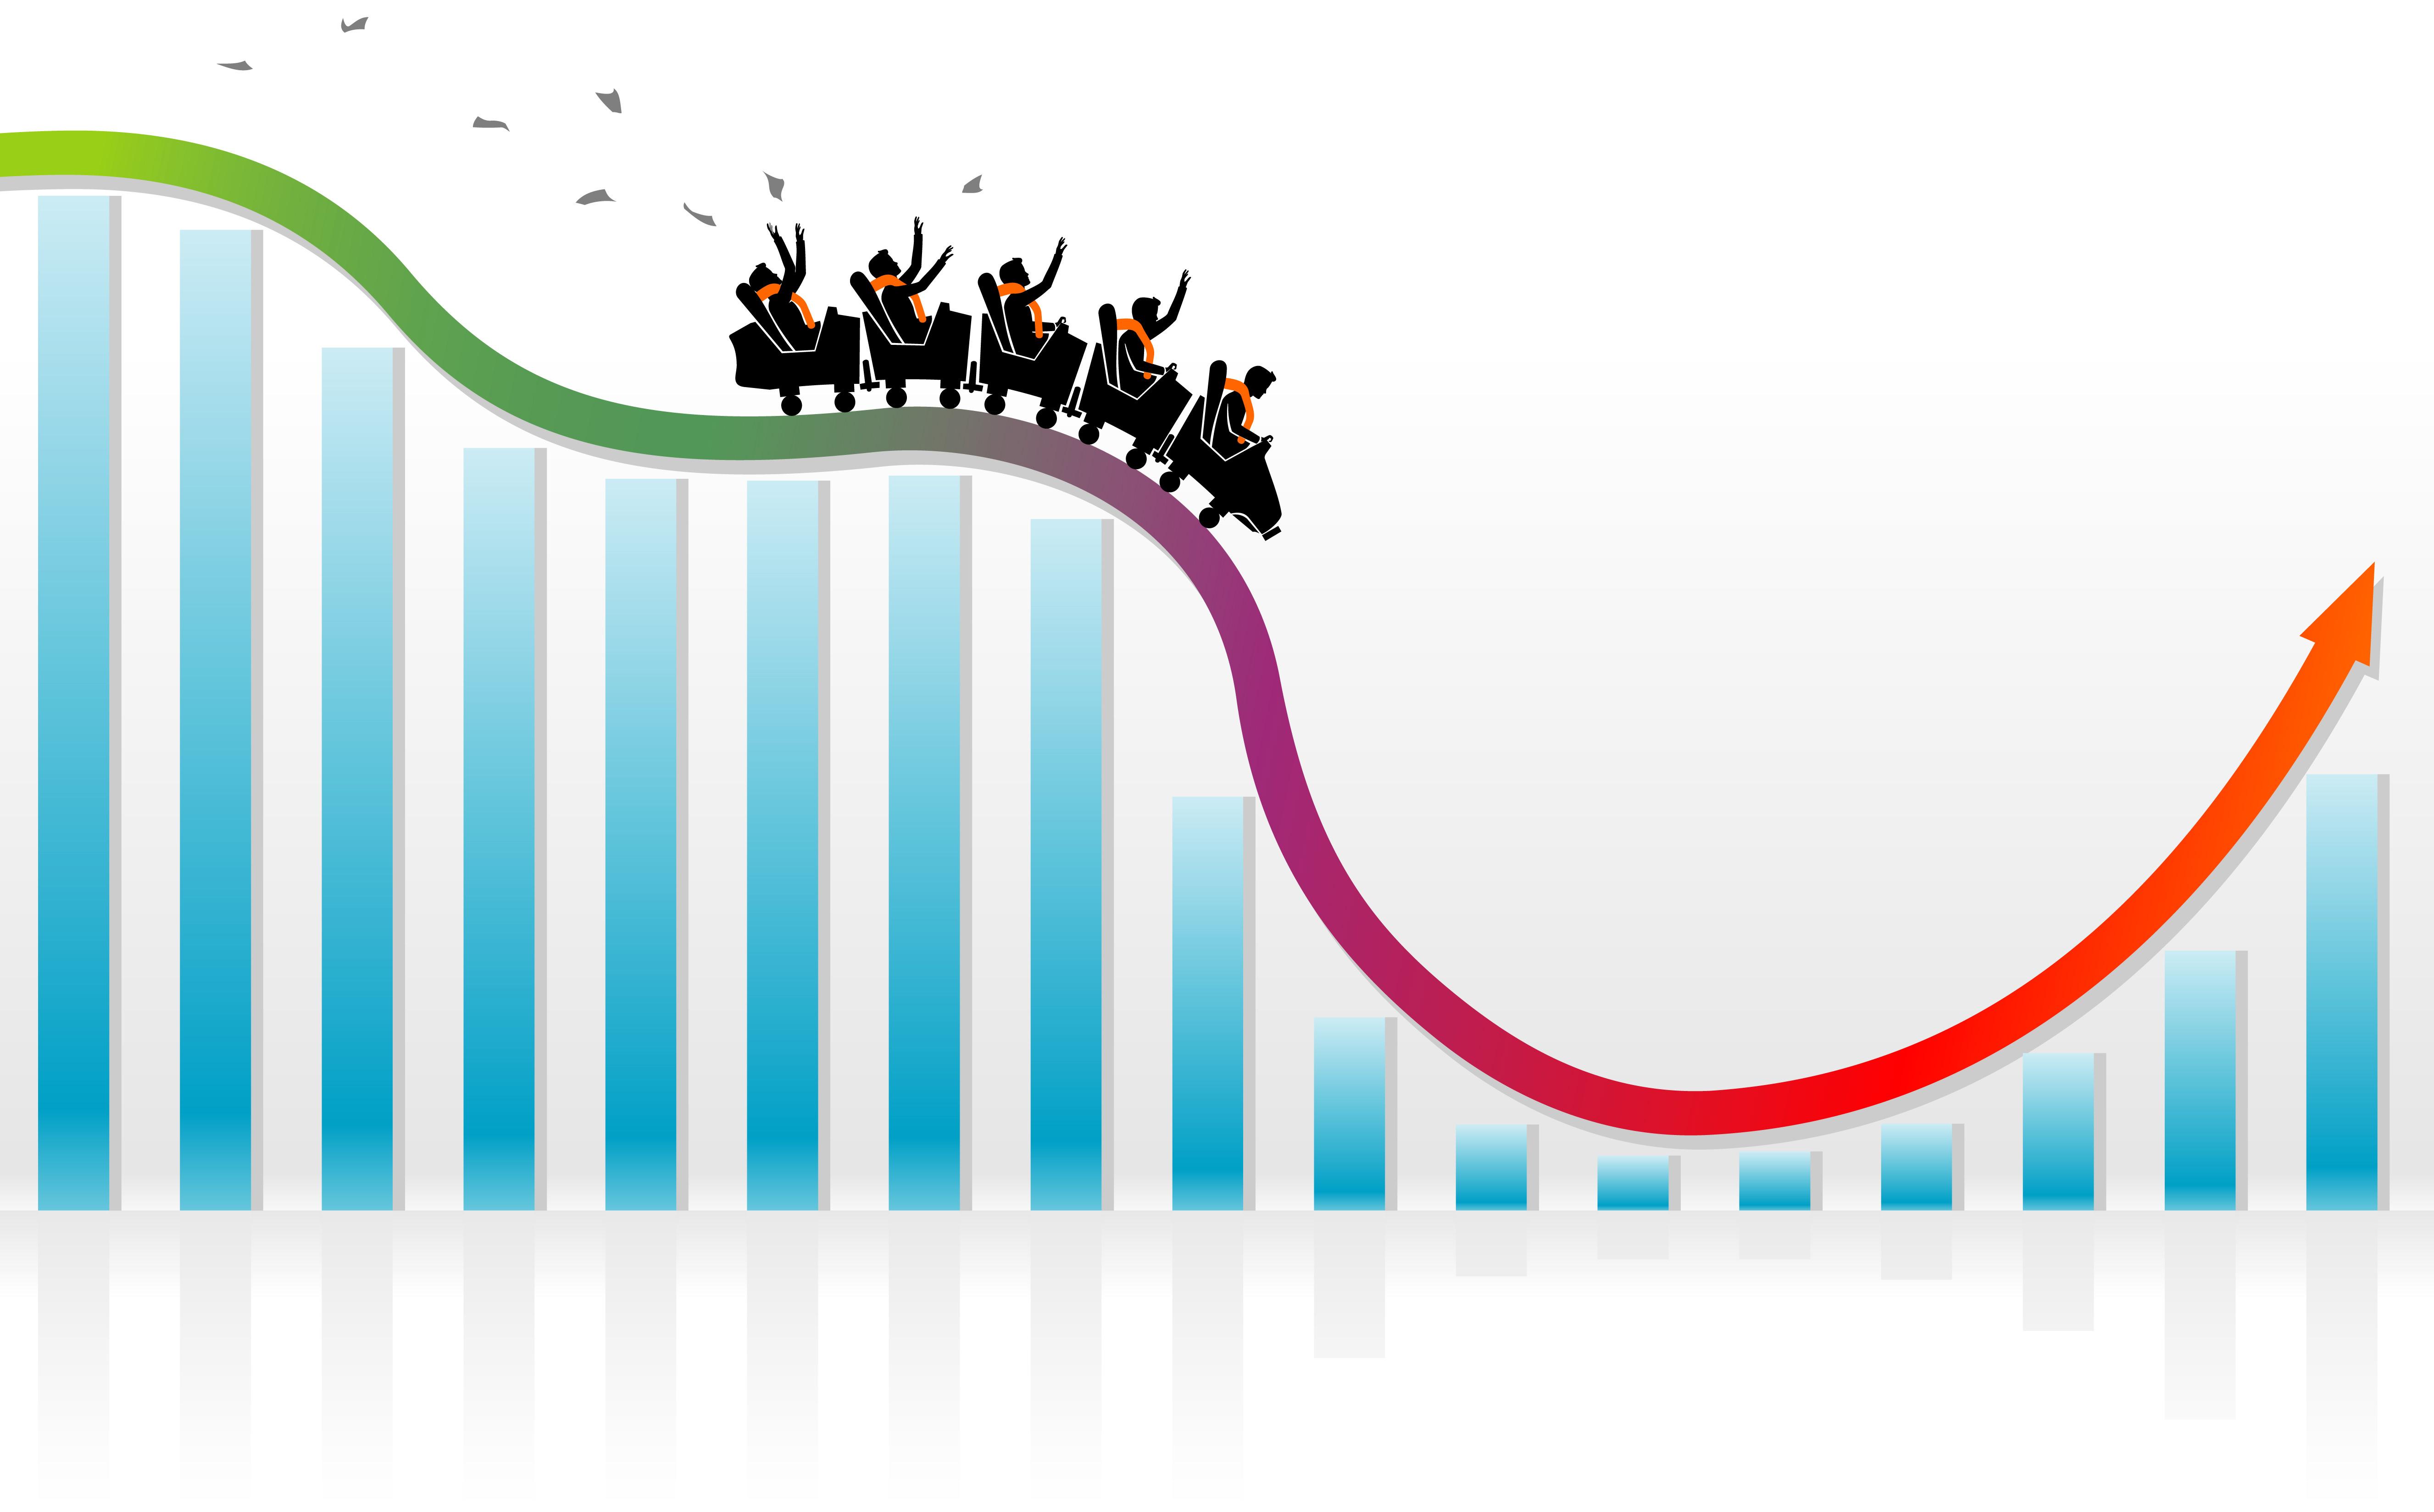 Mortgage rates crashed this week